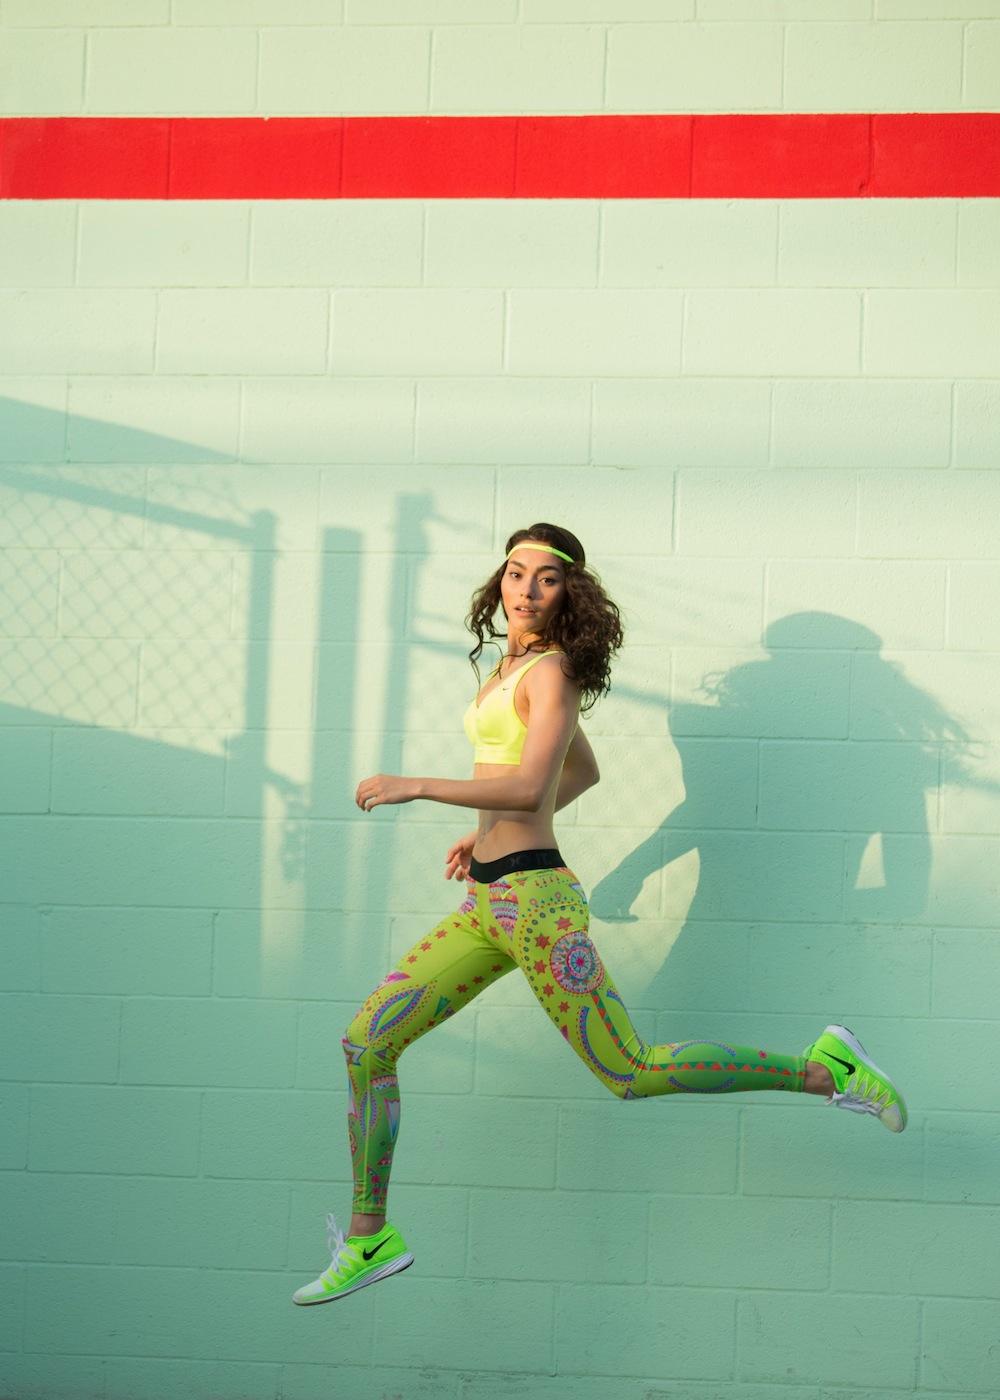 Las chicas fitness te motivan